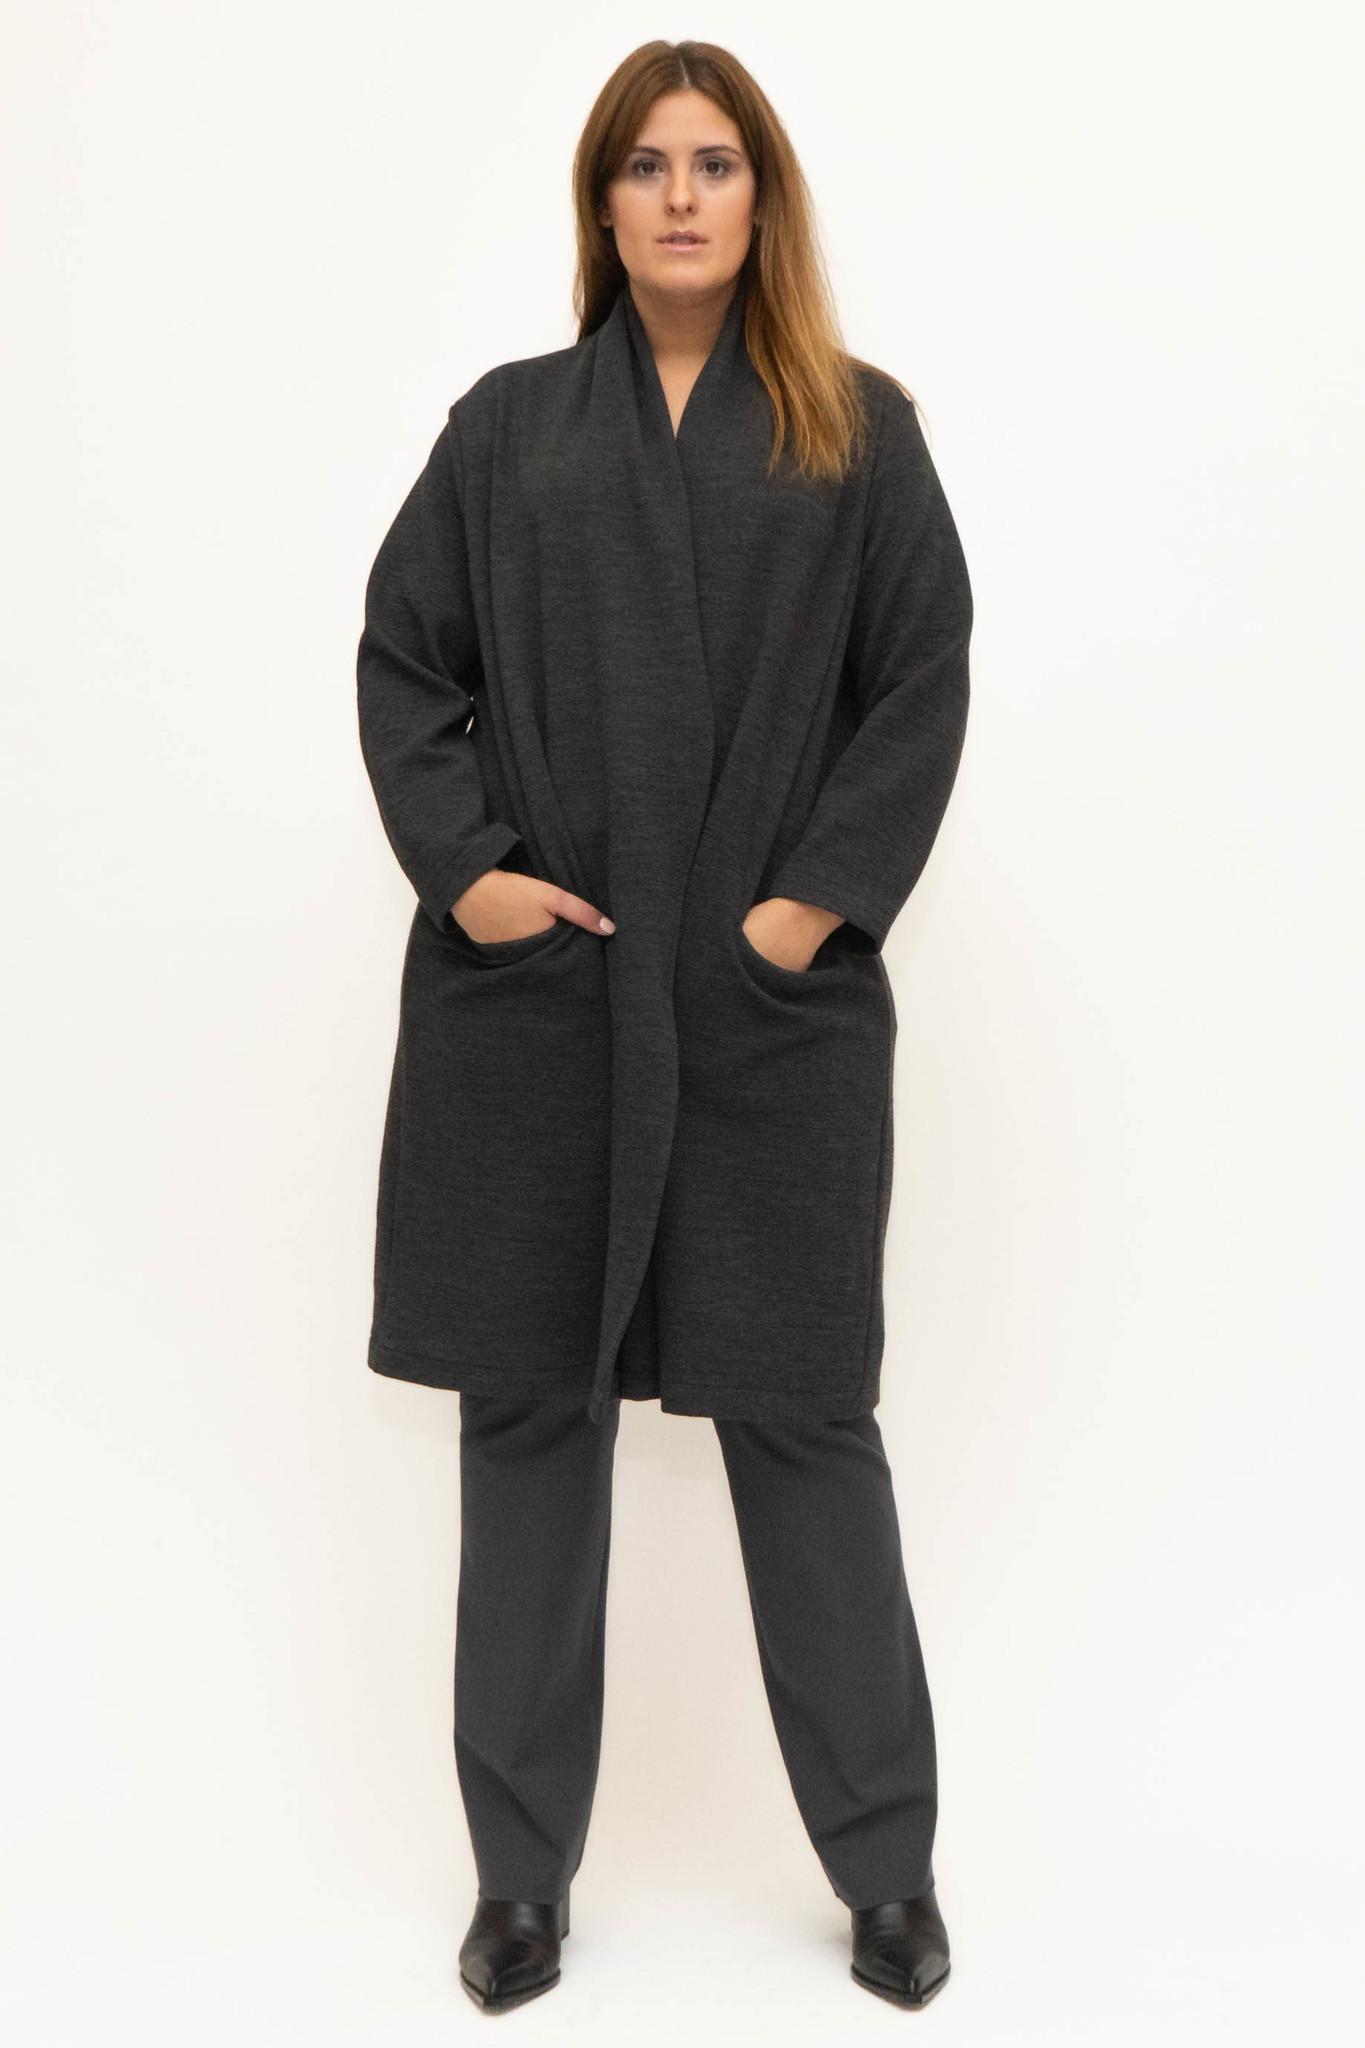 PHILIA Cardigan in Polyester-Virgin Wool blend-2